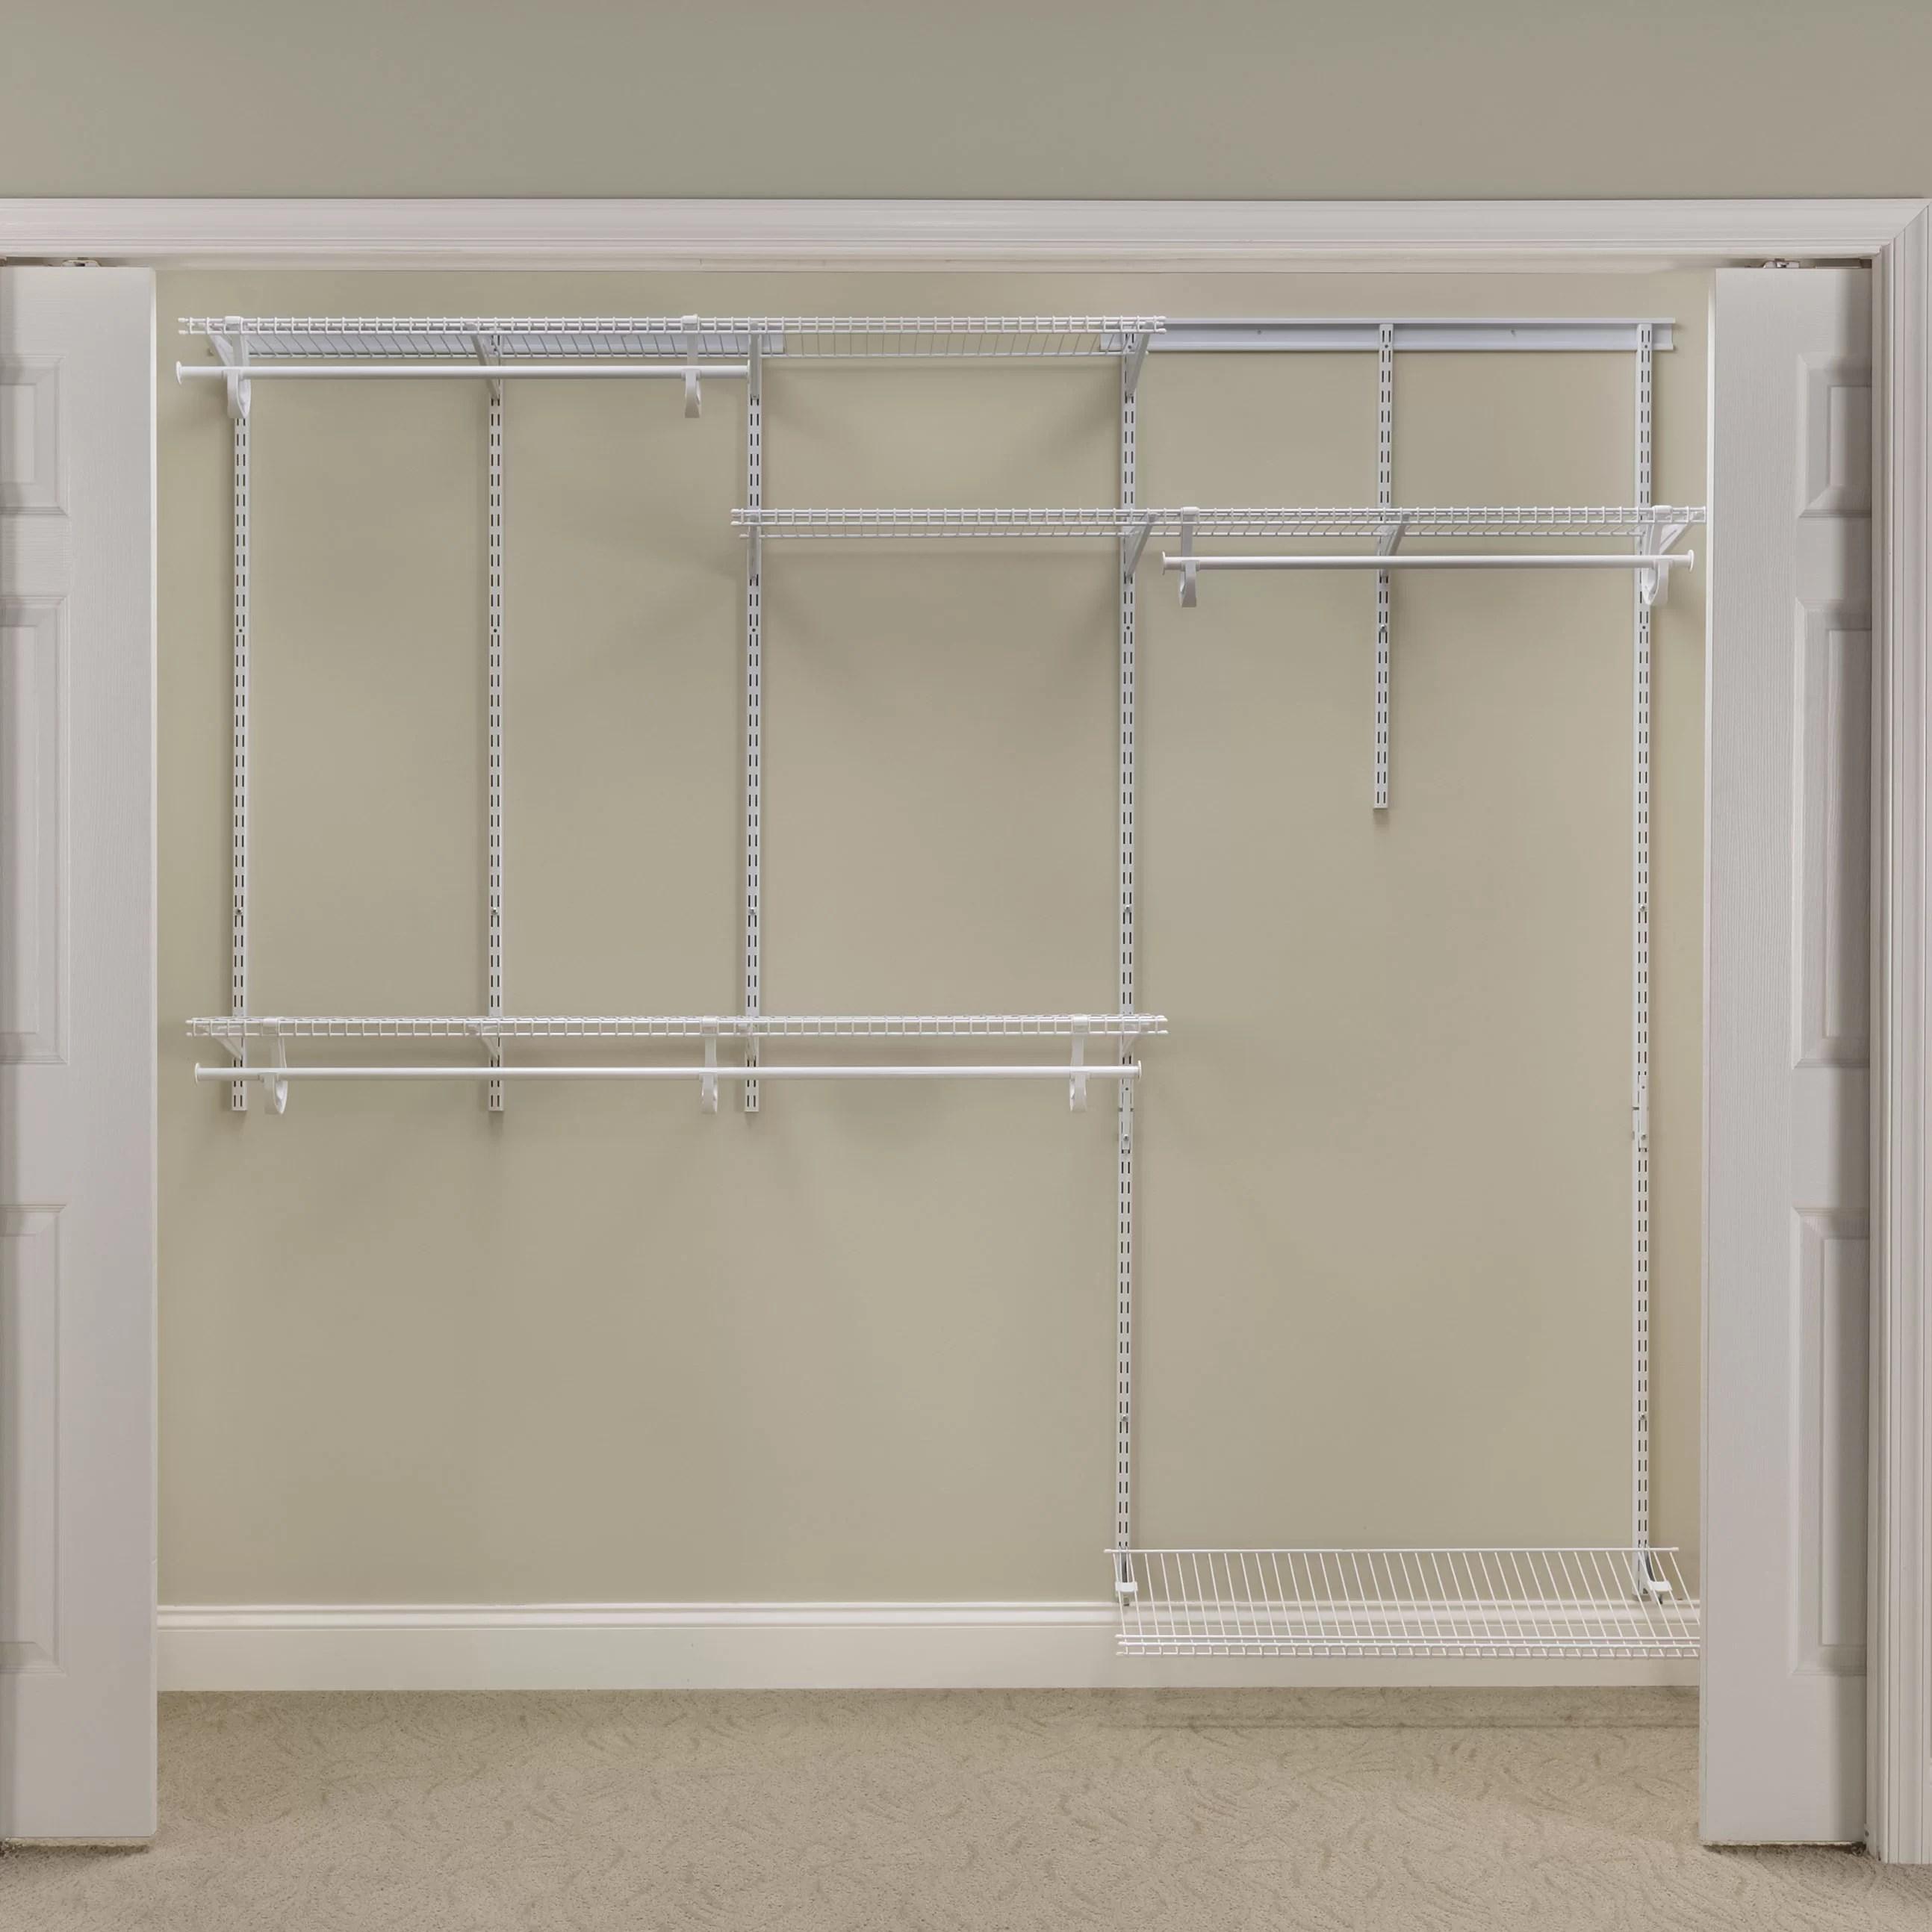 12 Inch Deep Closet Organizers